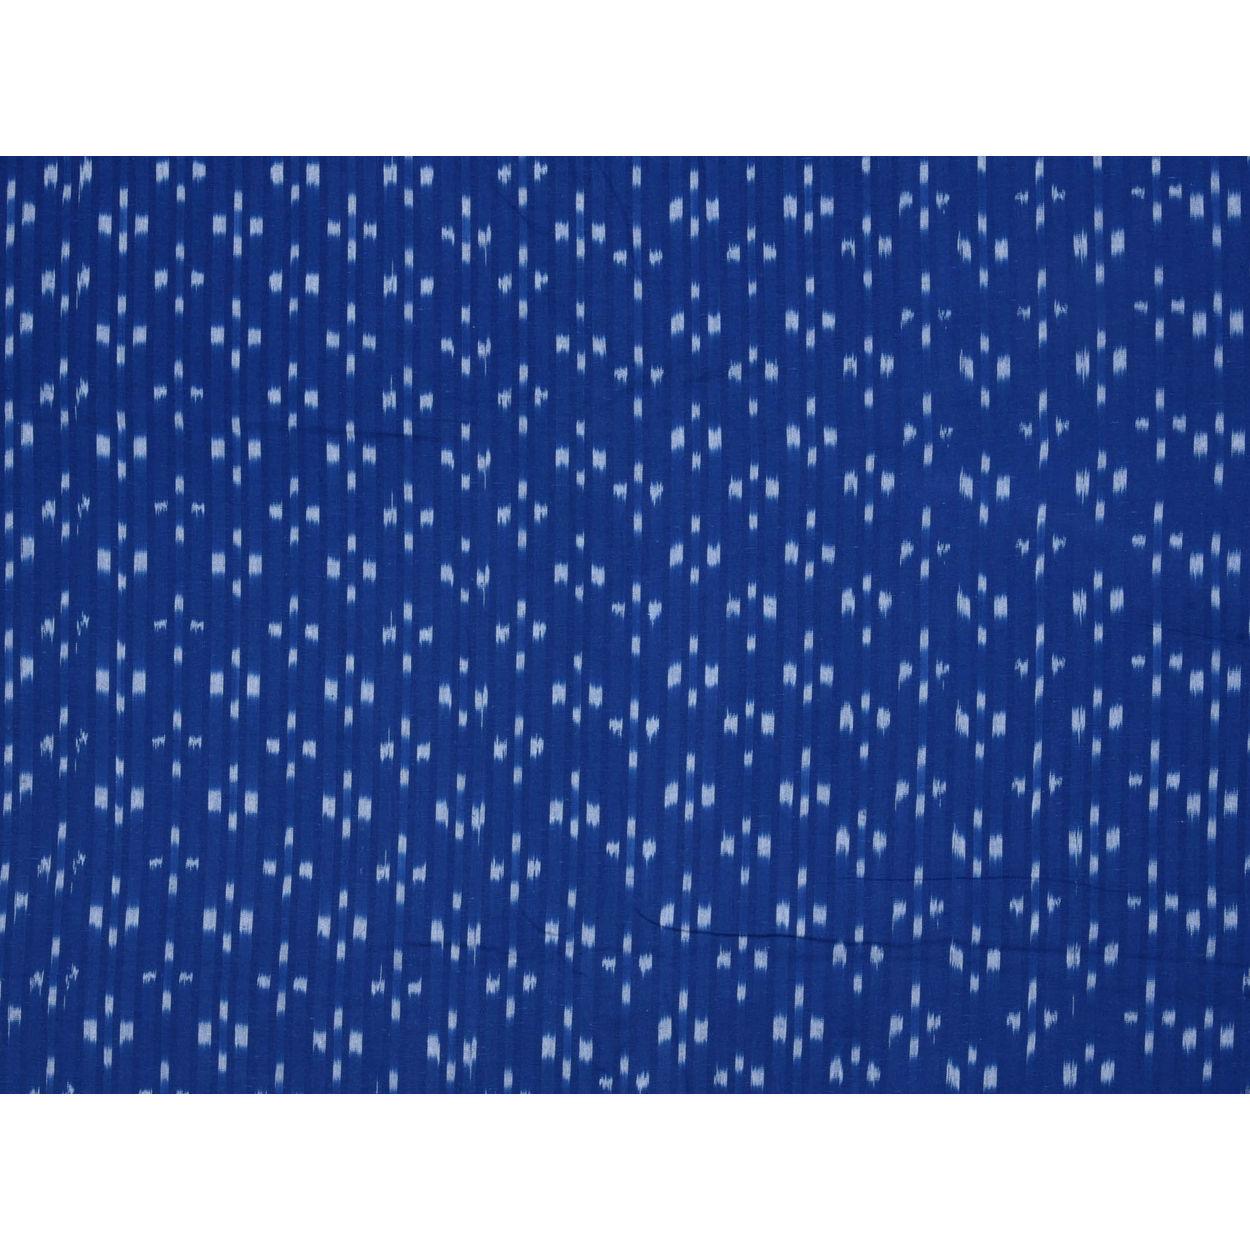 Ikat Cotton Handloom Fabric F0096